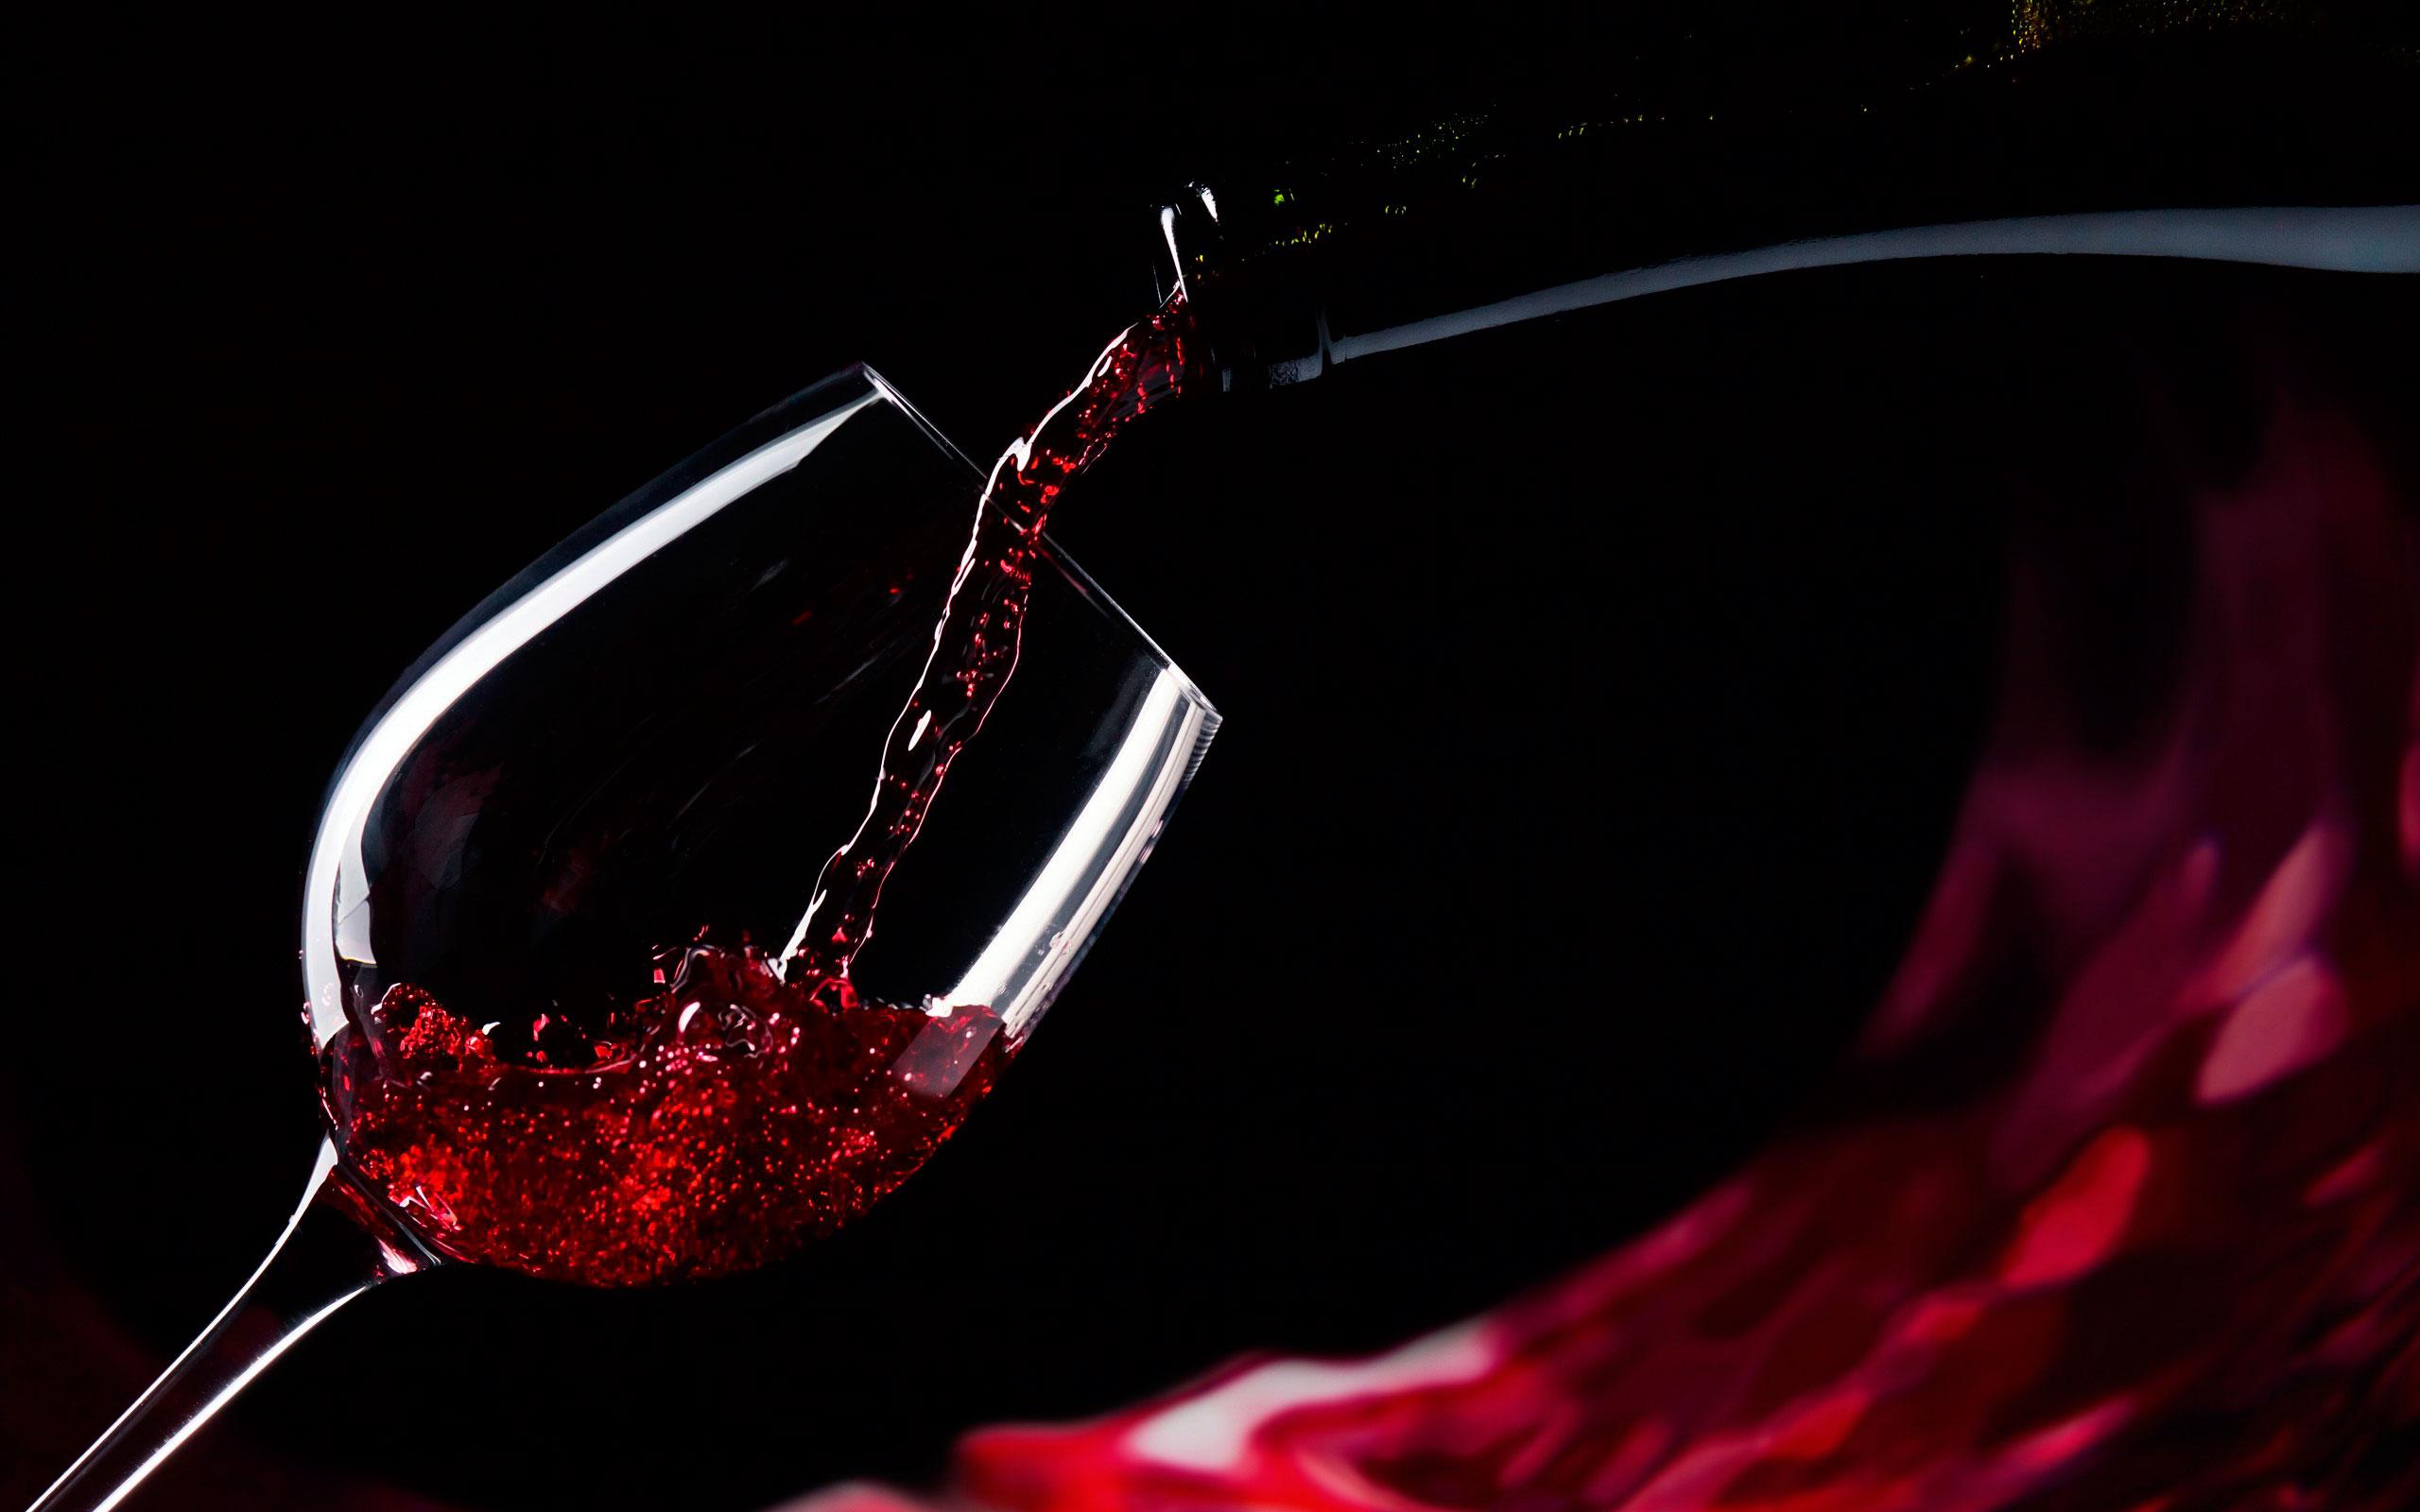 тому обои на рабочий стол бокал красного вина они часами думали